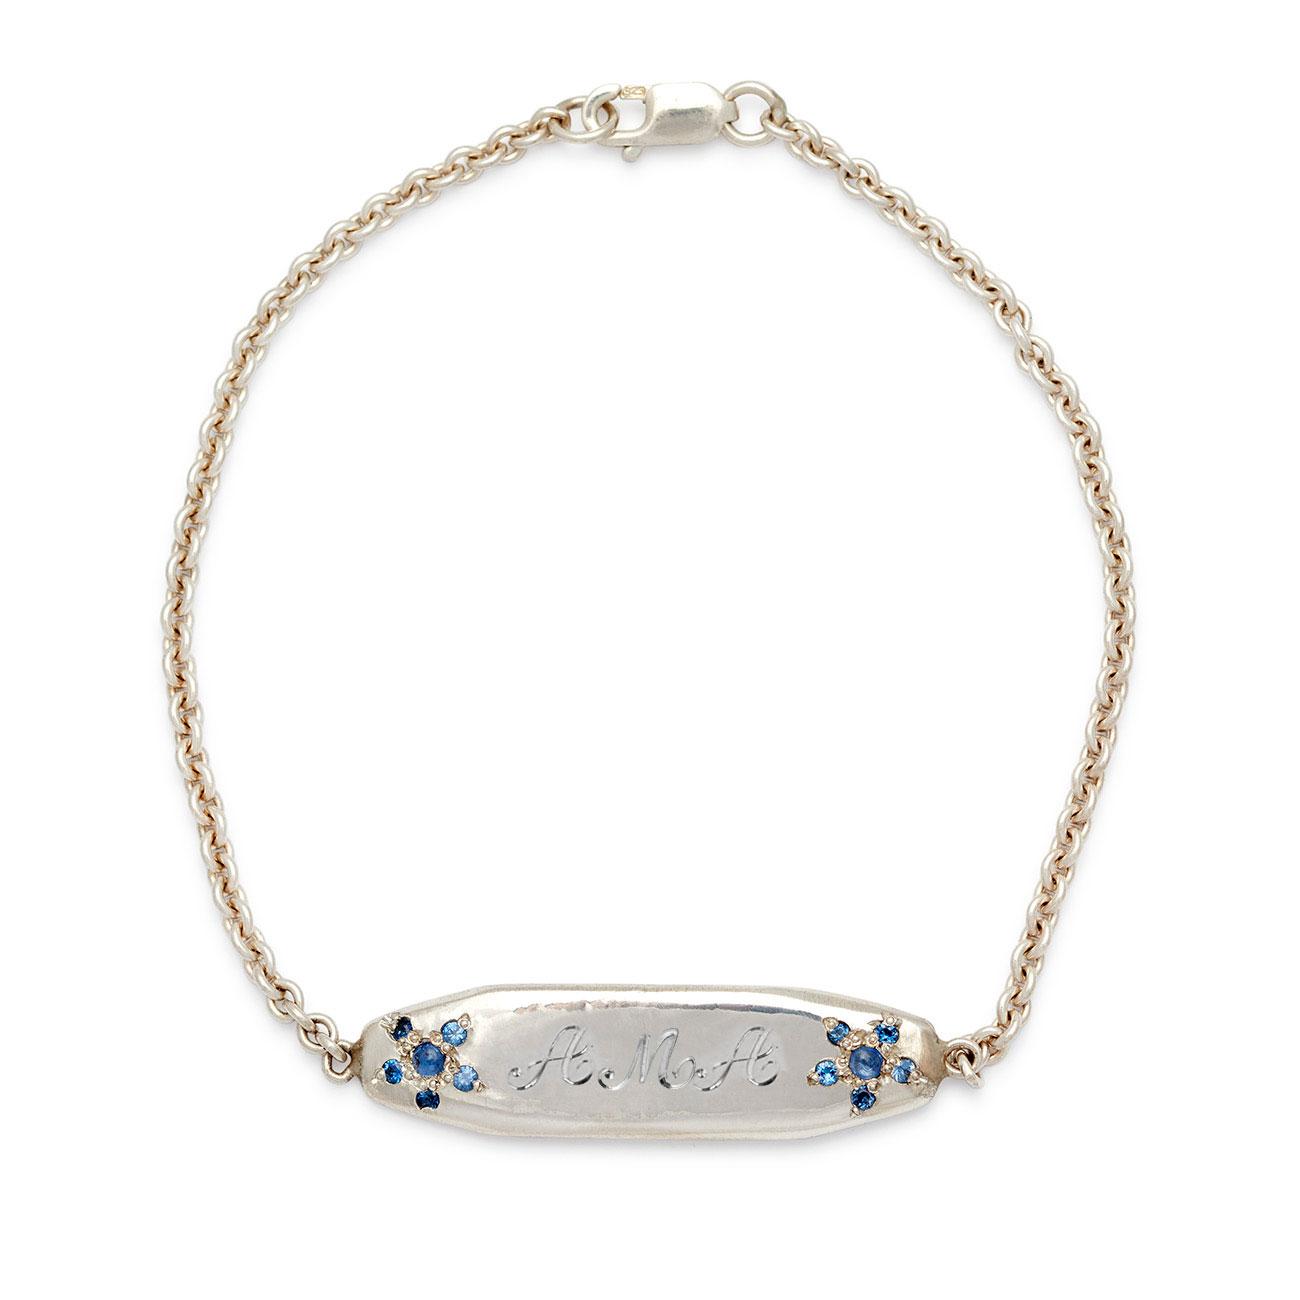 blue sapphire flower id bracelet elisa solomon jewelry. Black Bedroom Furniture Sets. Home Design Ideas